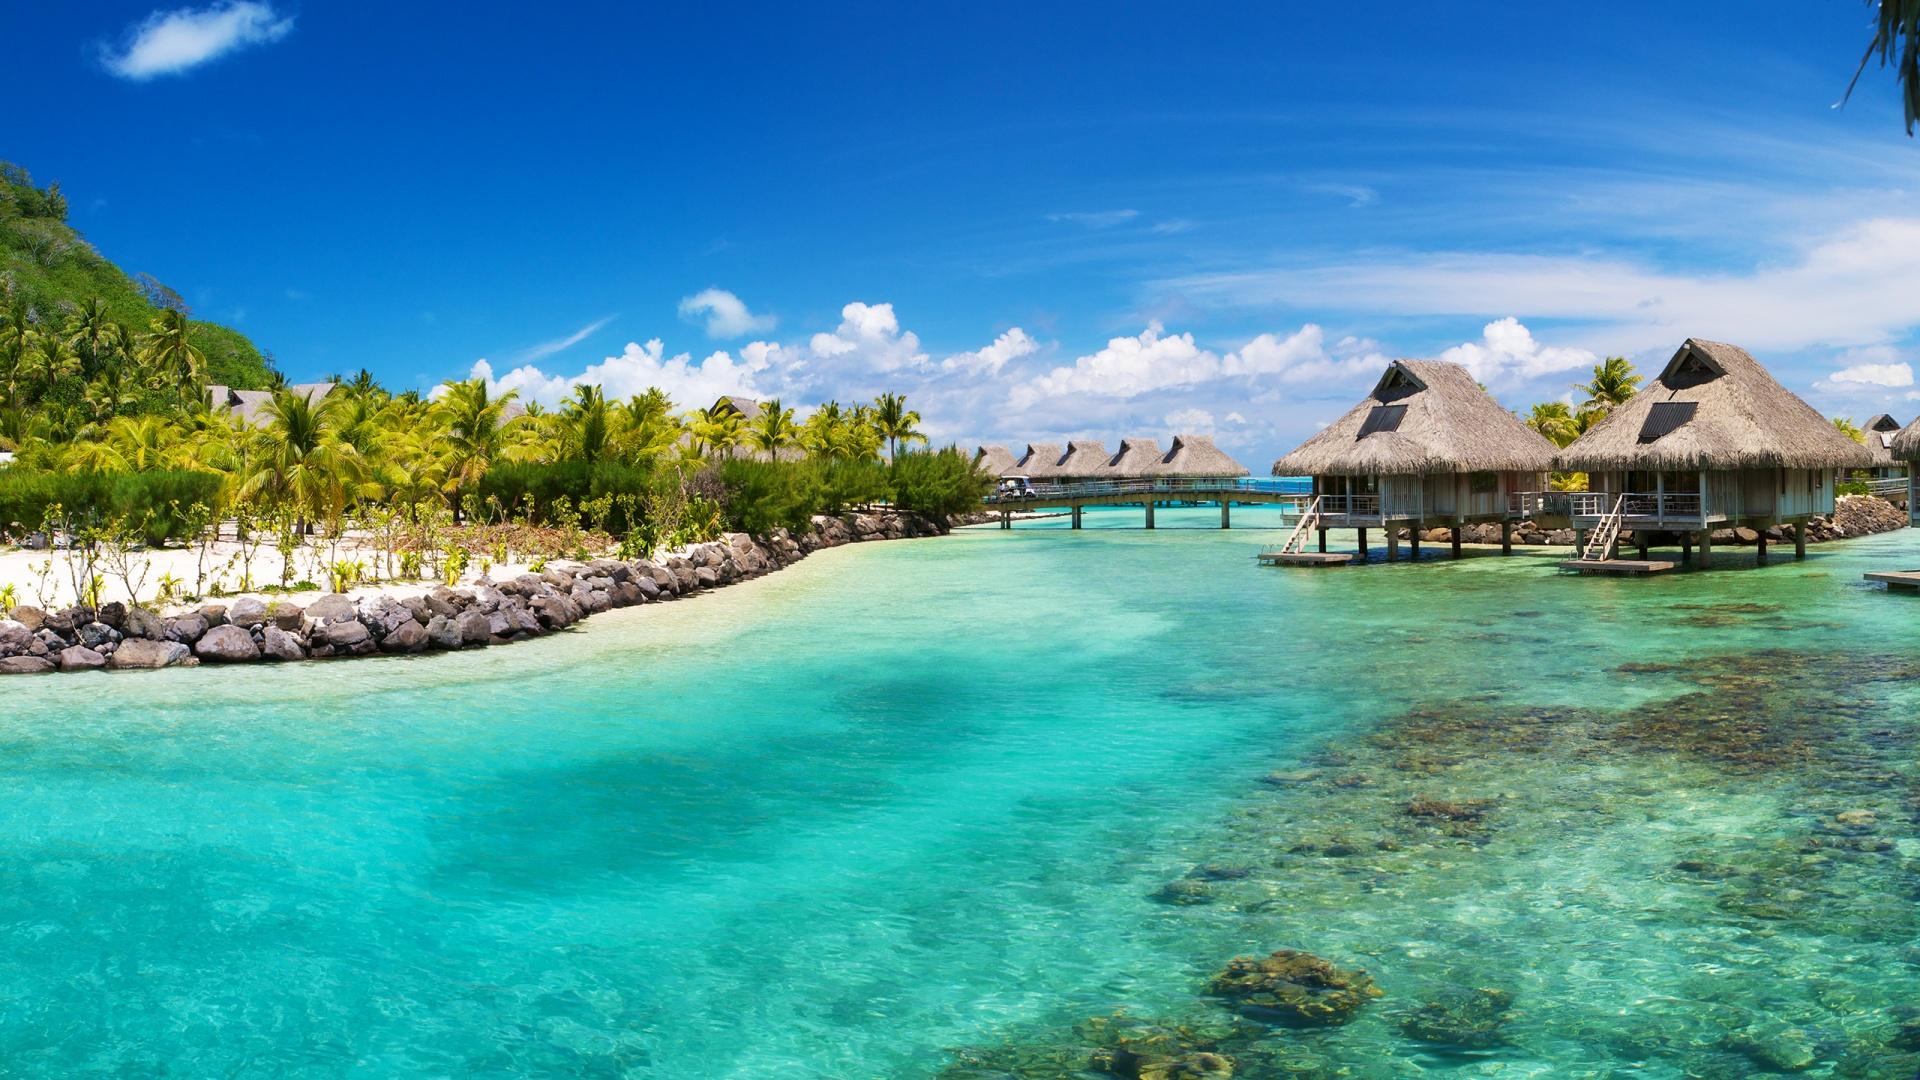 Belize Wallpaper · Belize Wallpaper ...